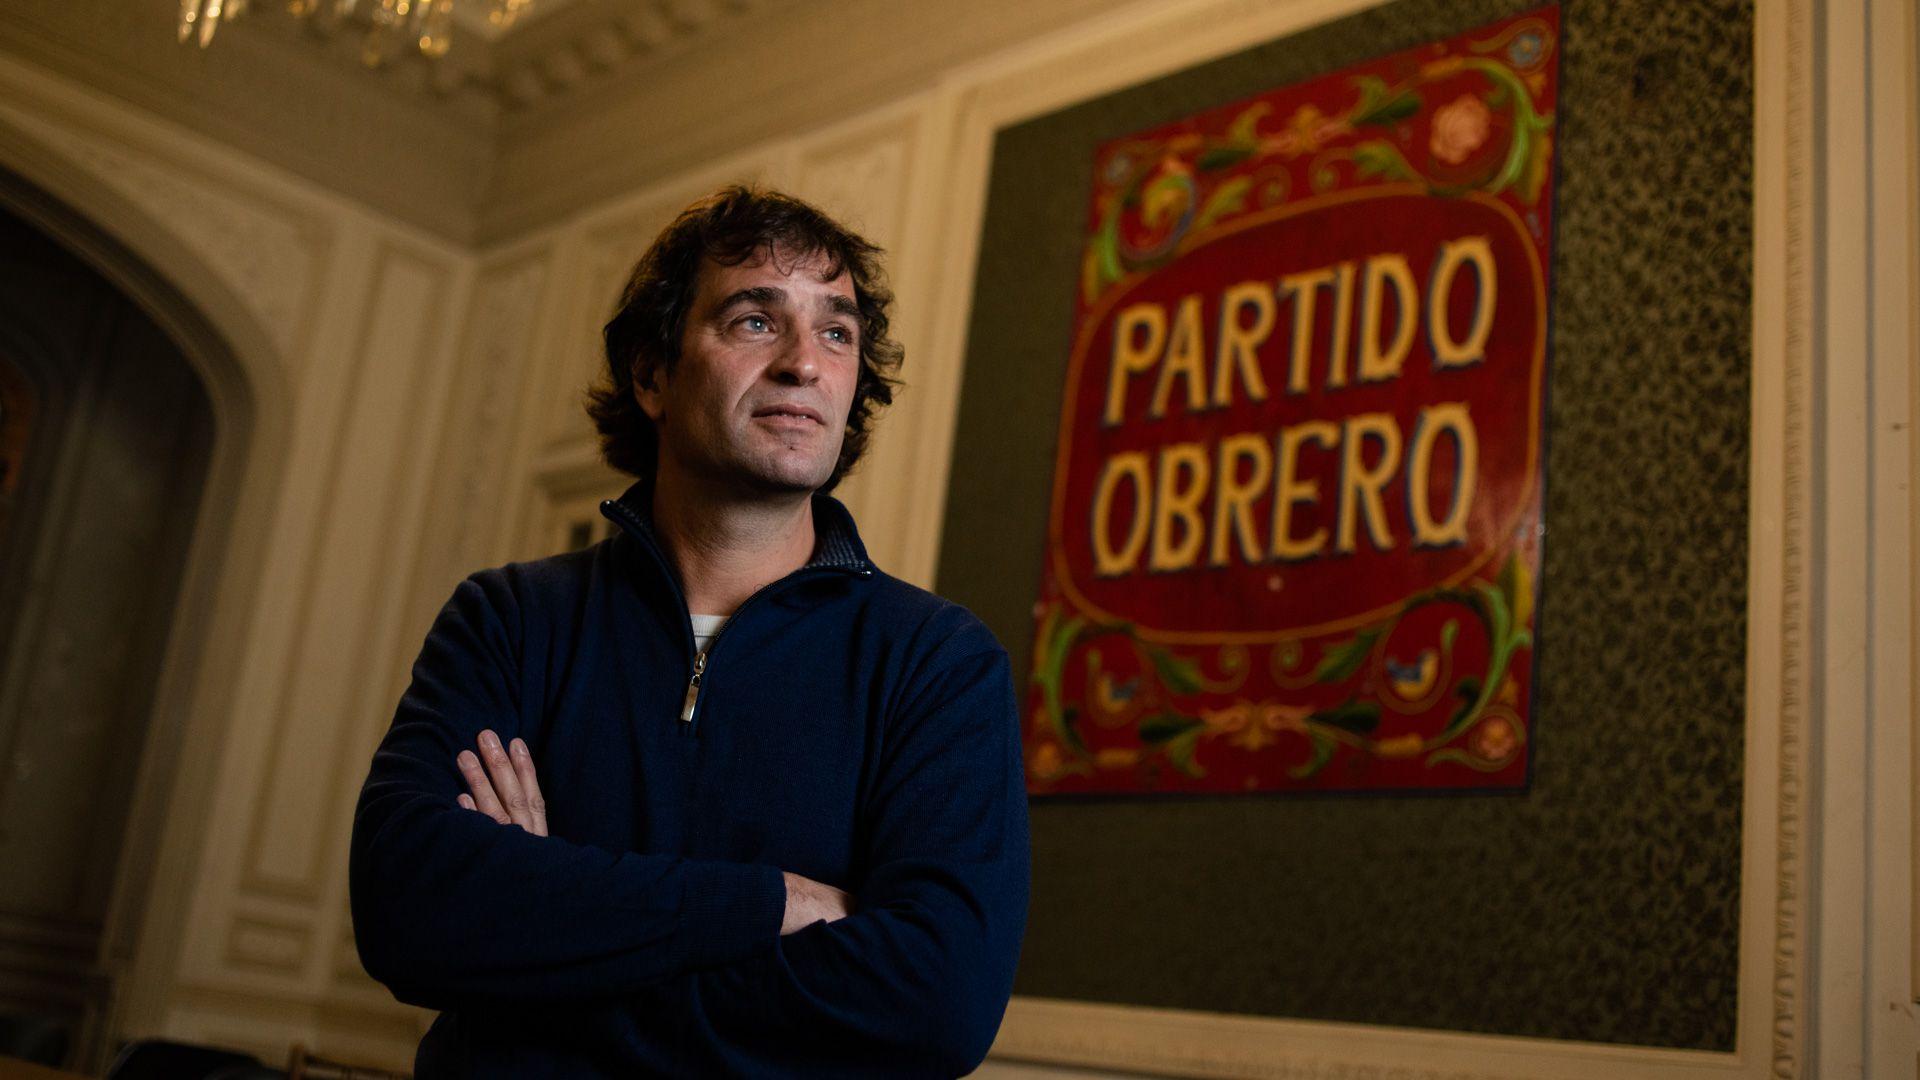 Gabriel Solano . Partido Obrero